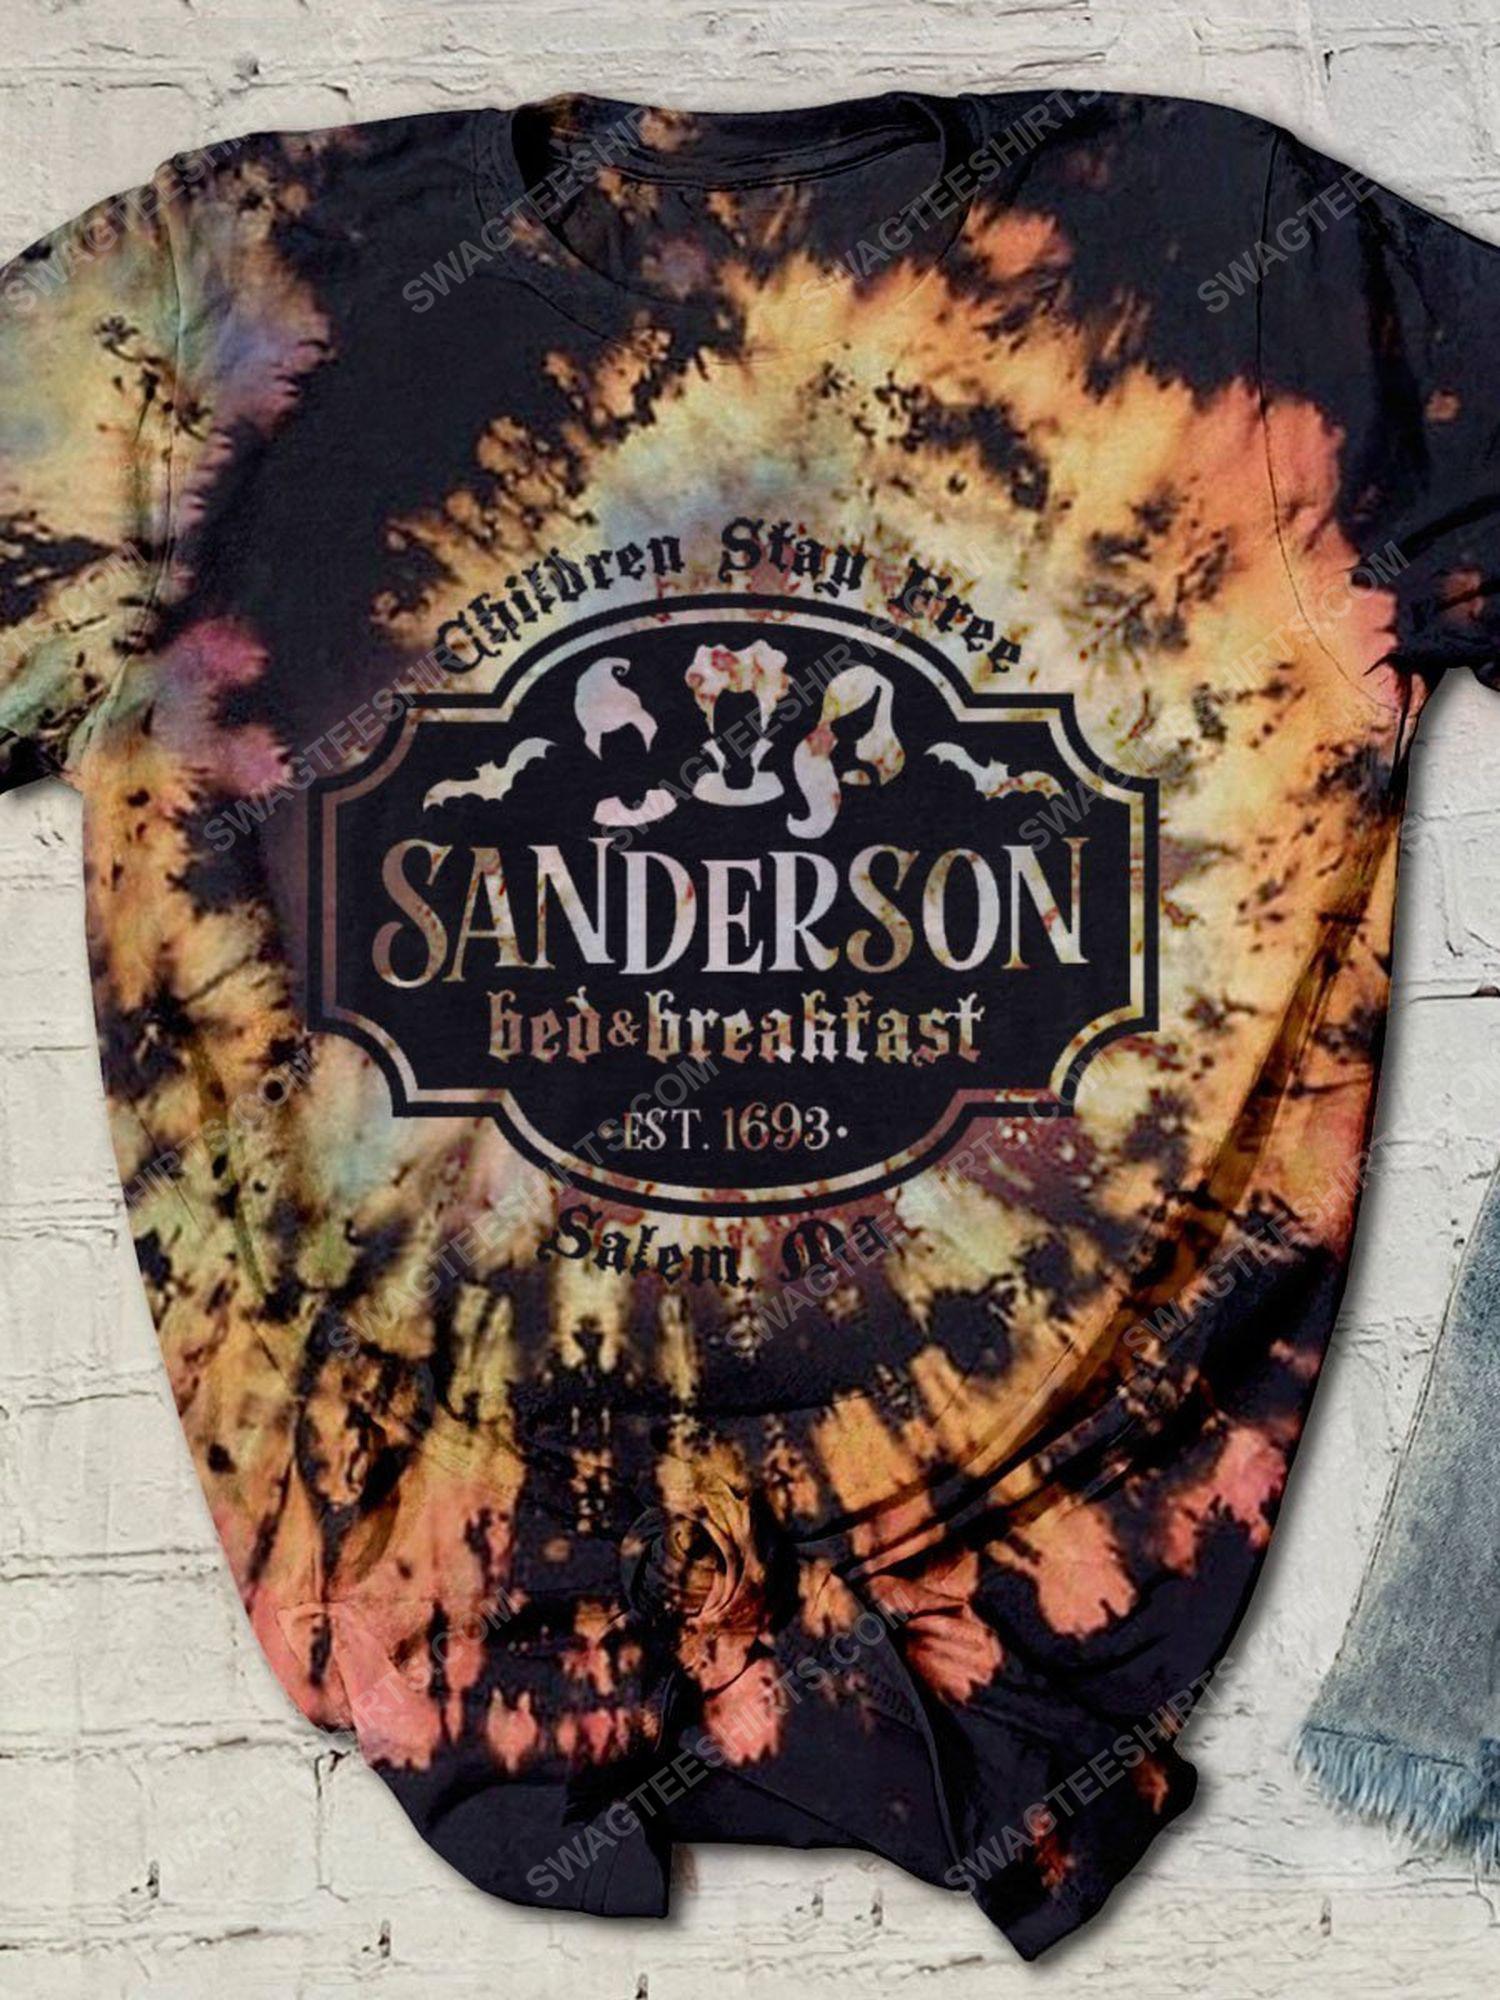 Halloween sanderson sisters children stay free shirt 1 - Copy (3)